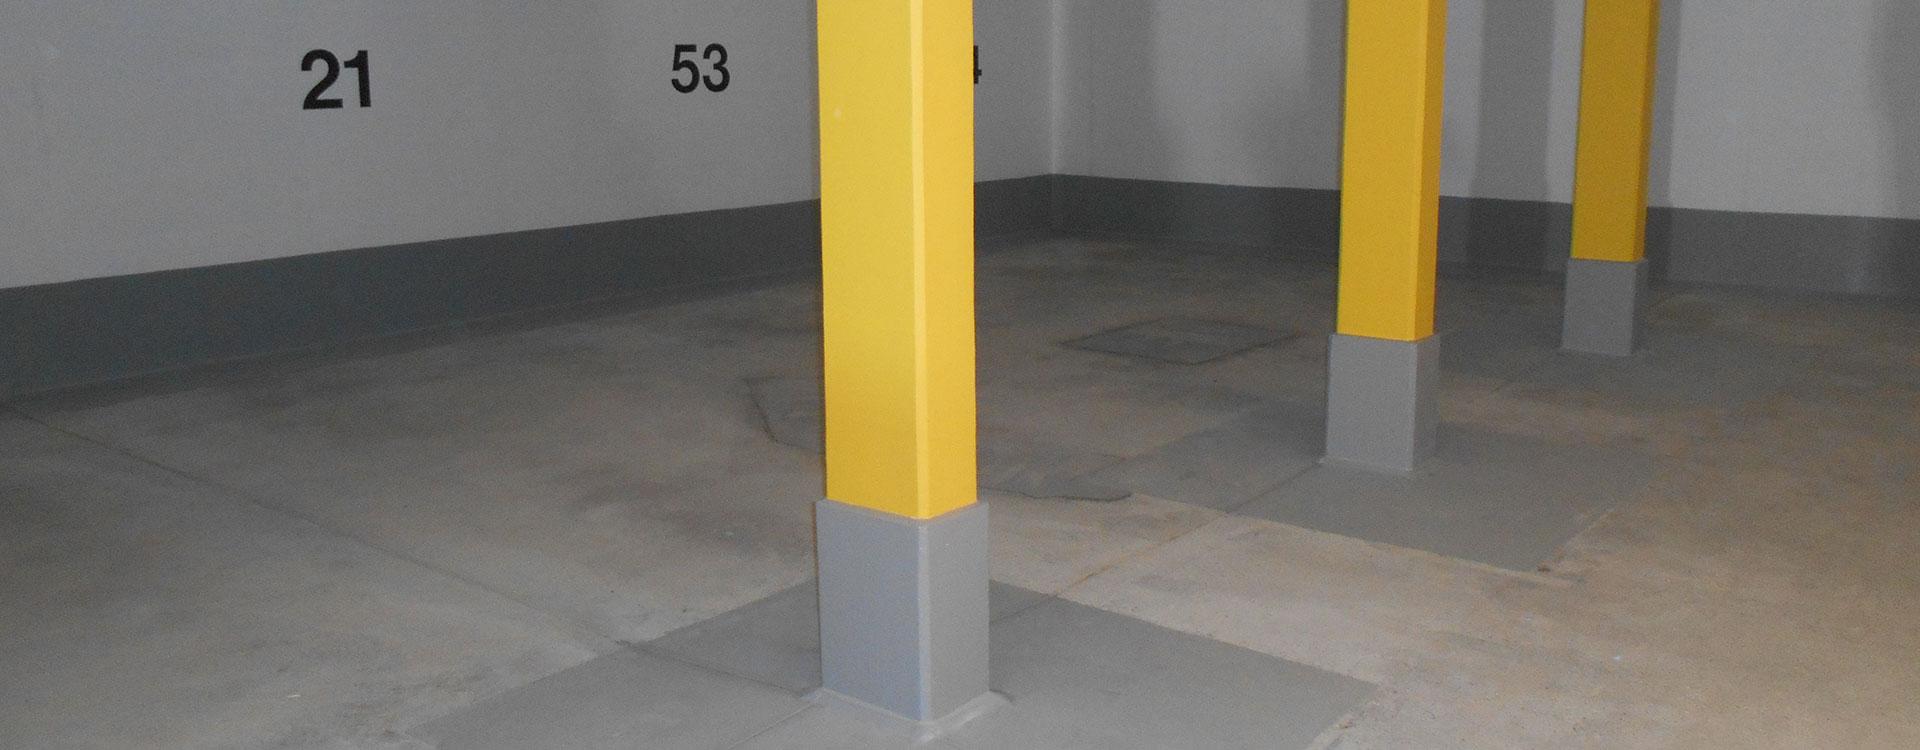 Tiefgaragen - Instandsetzung